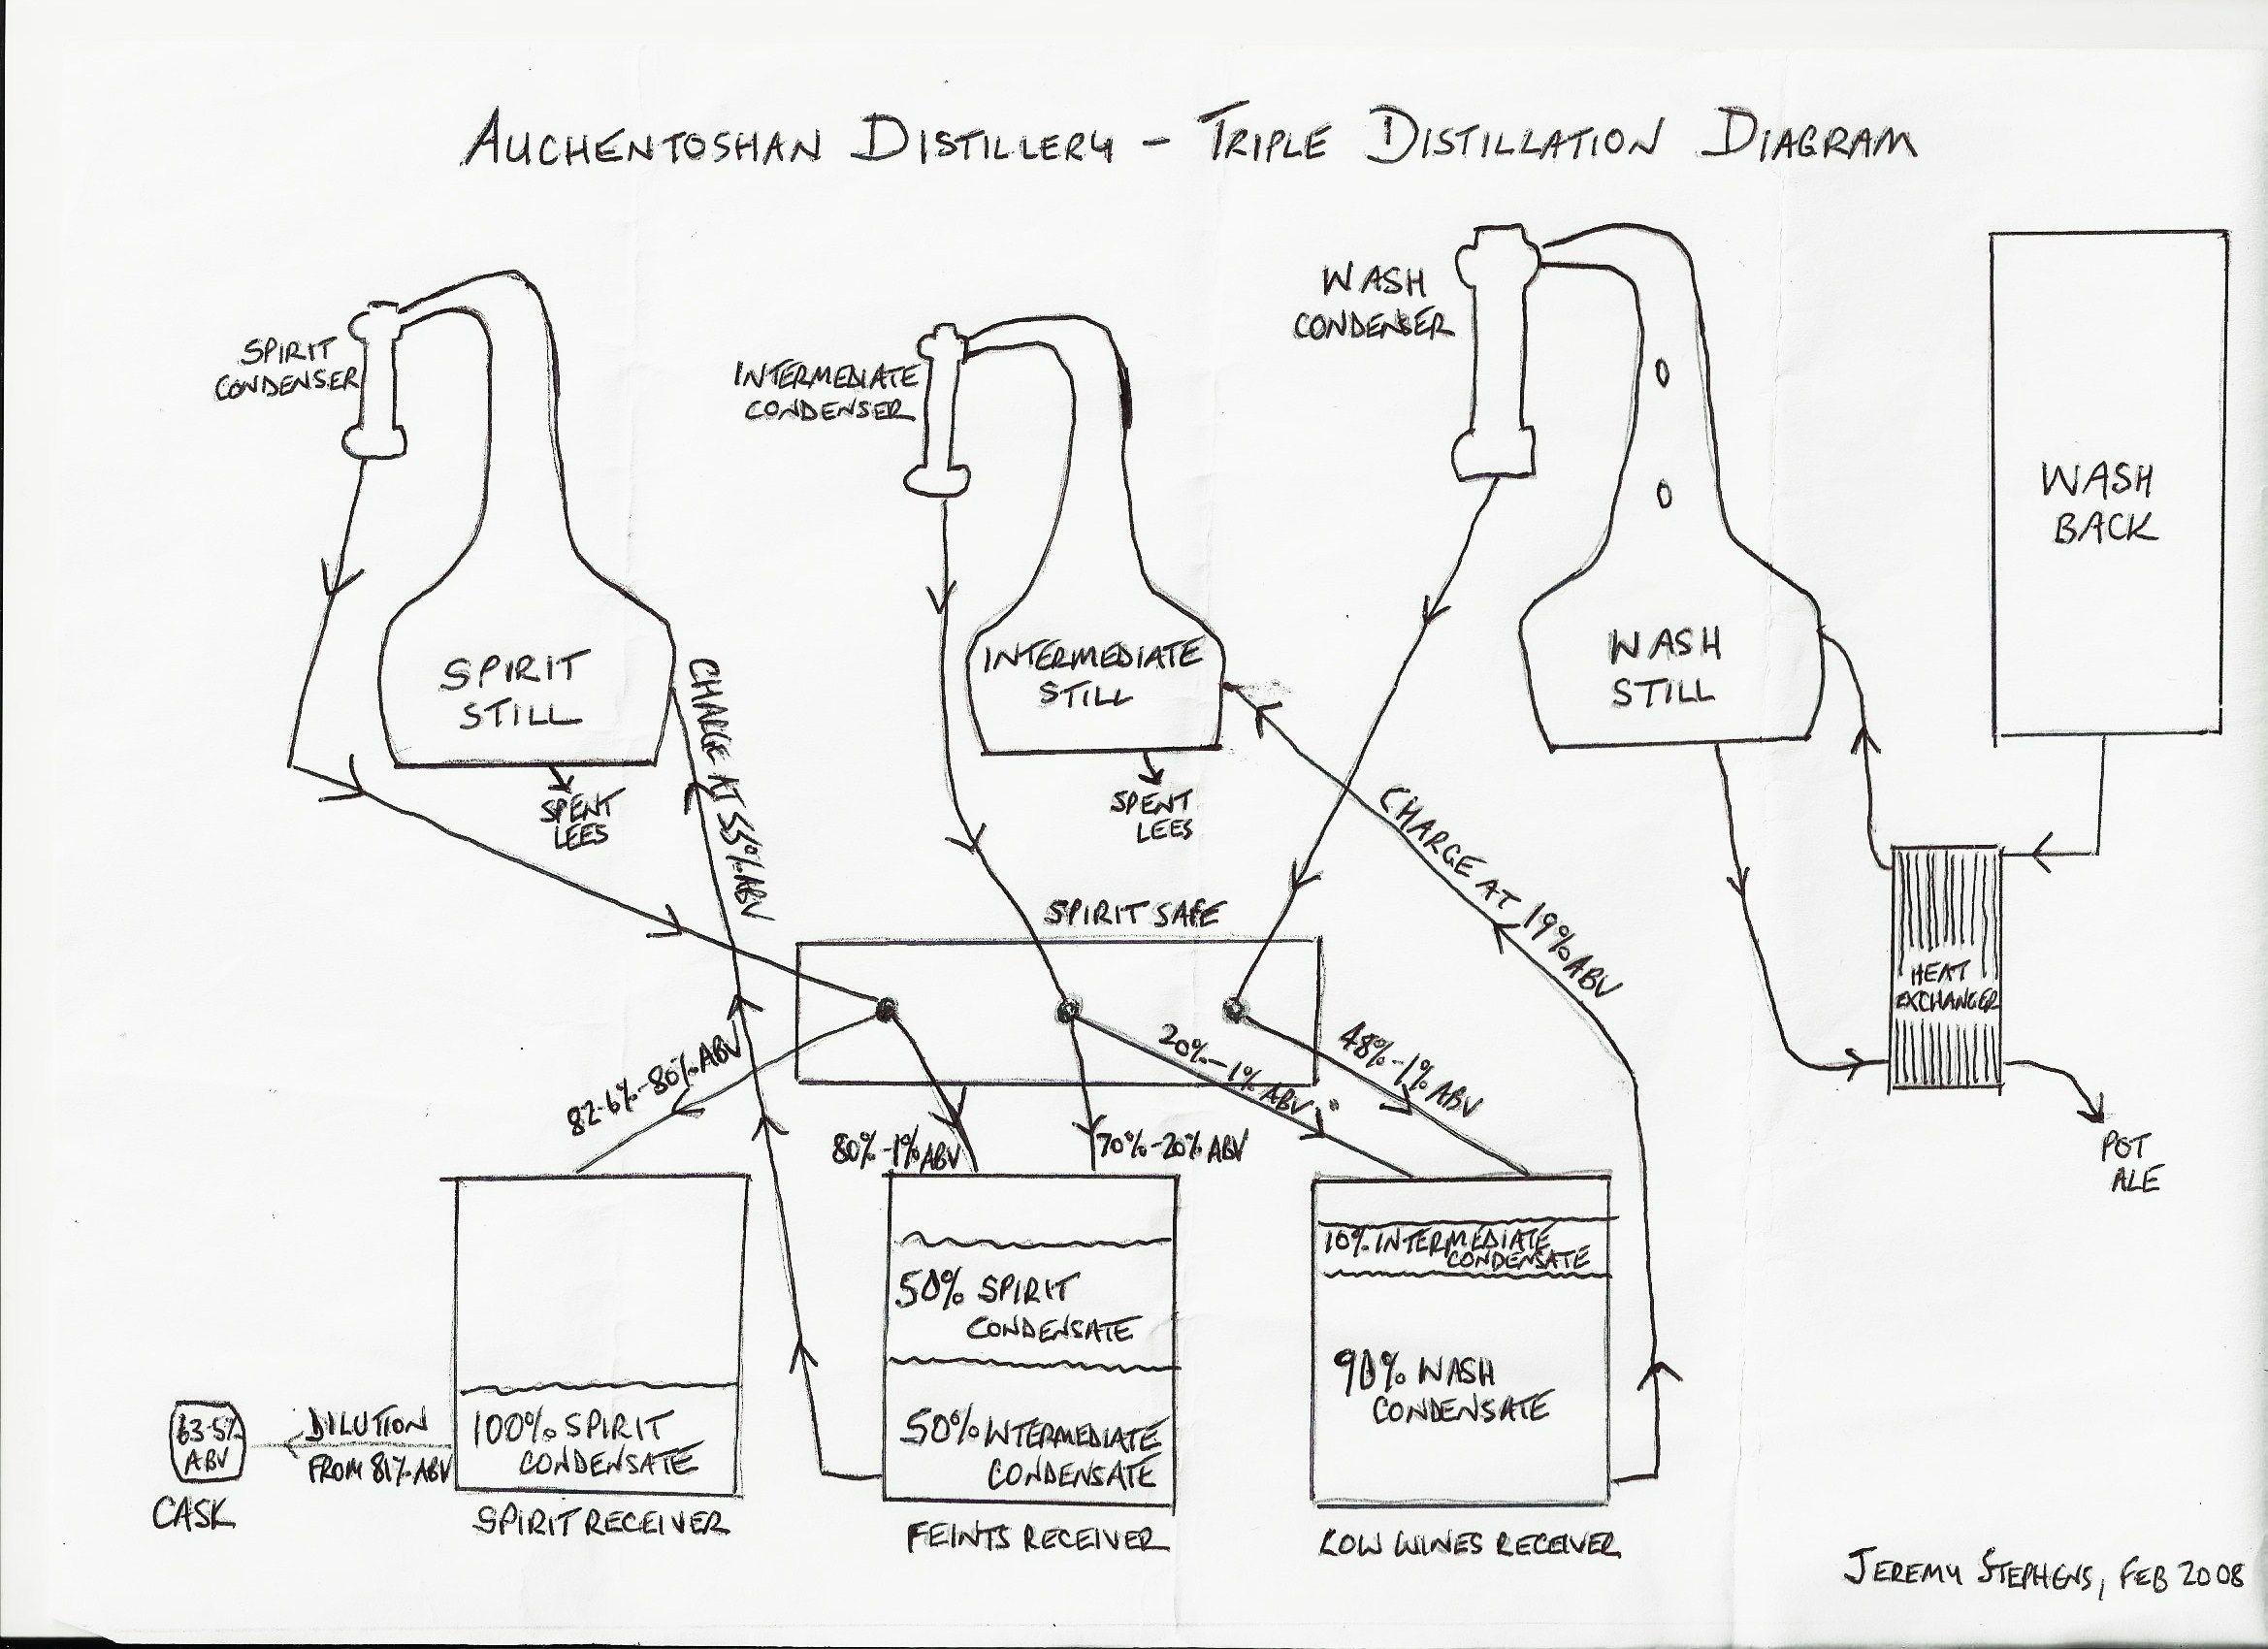 Auchentoshan Triple Distil Diagram Drawn By Distillery